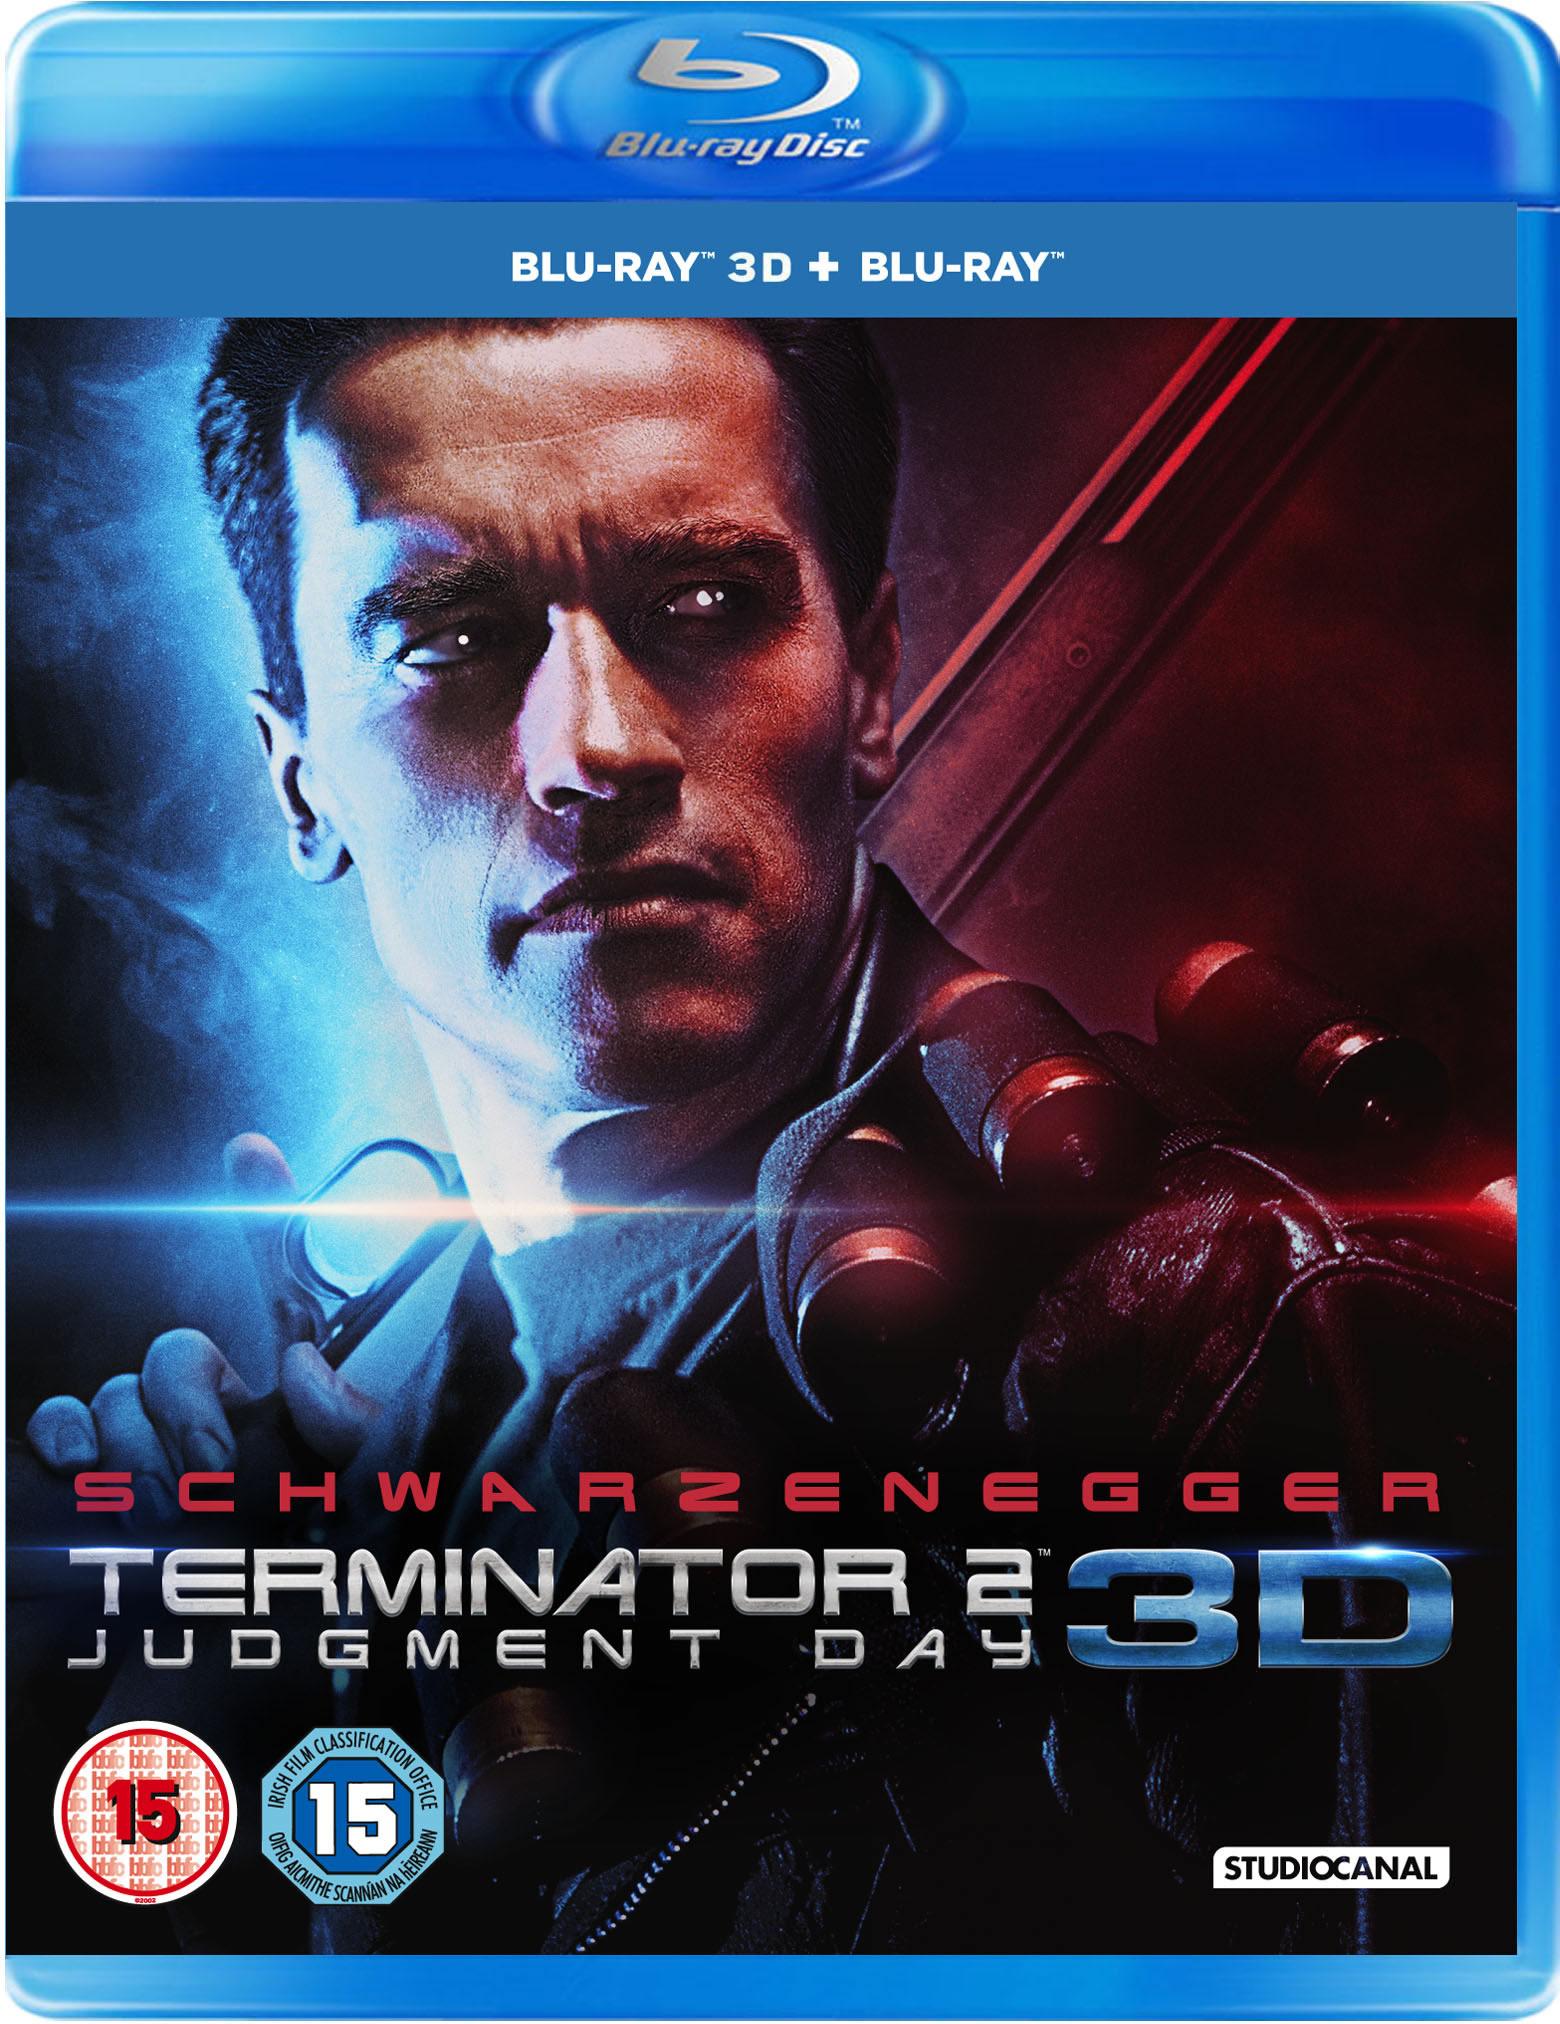 TERMINATOR_2_3D_BD_2D